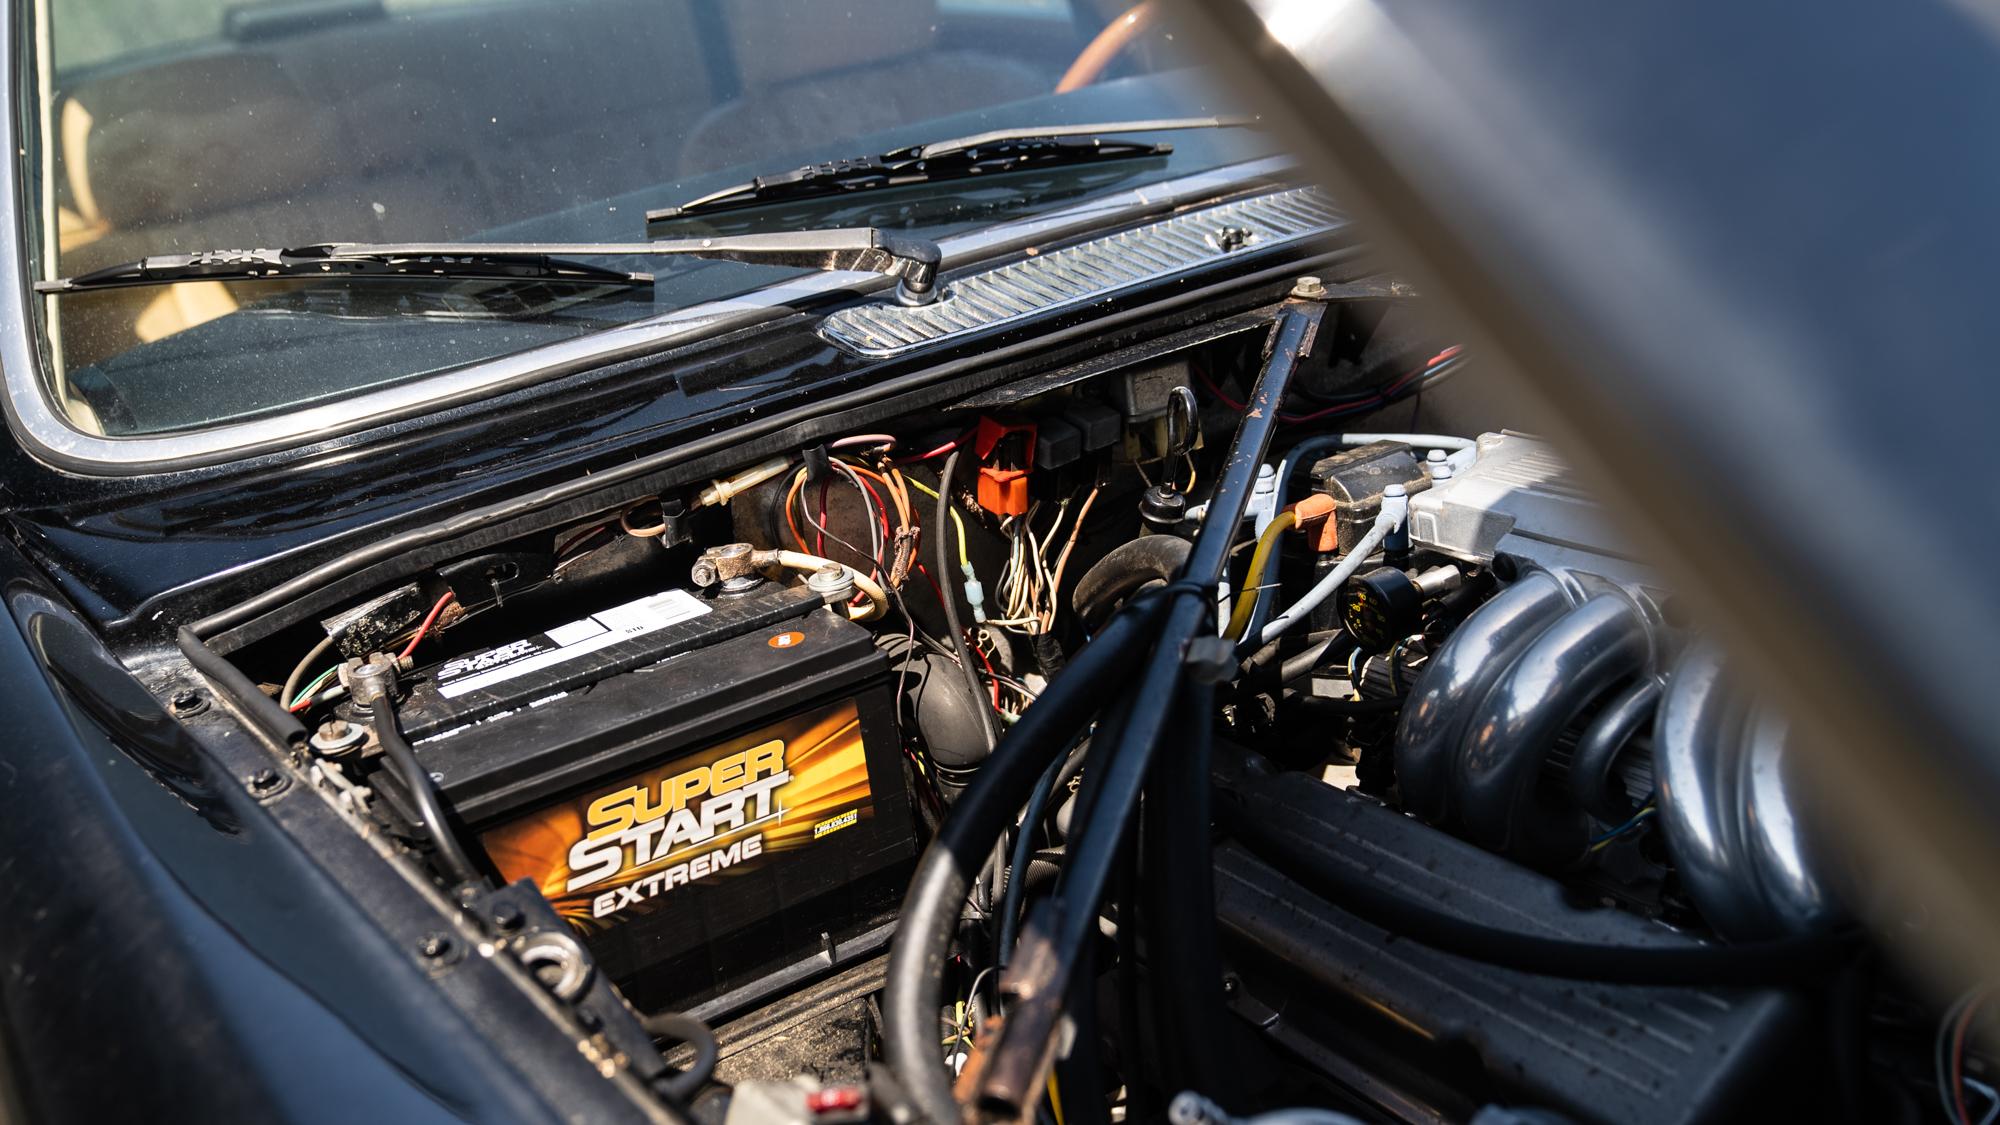 1986 Jaguar XJ6 engine